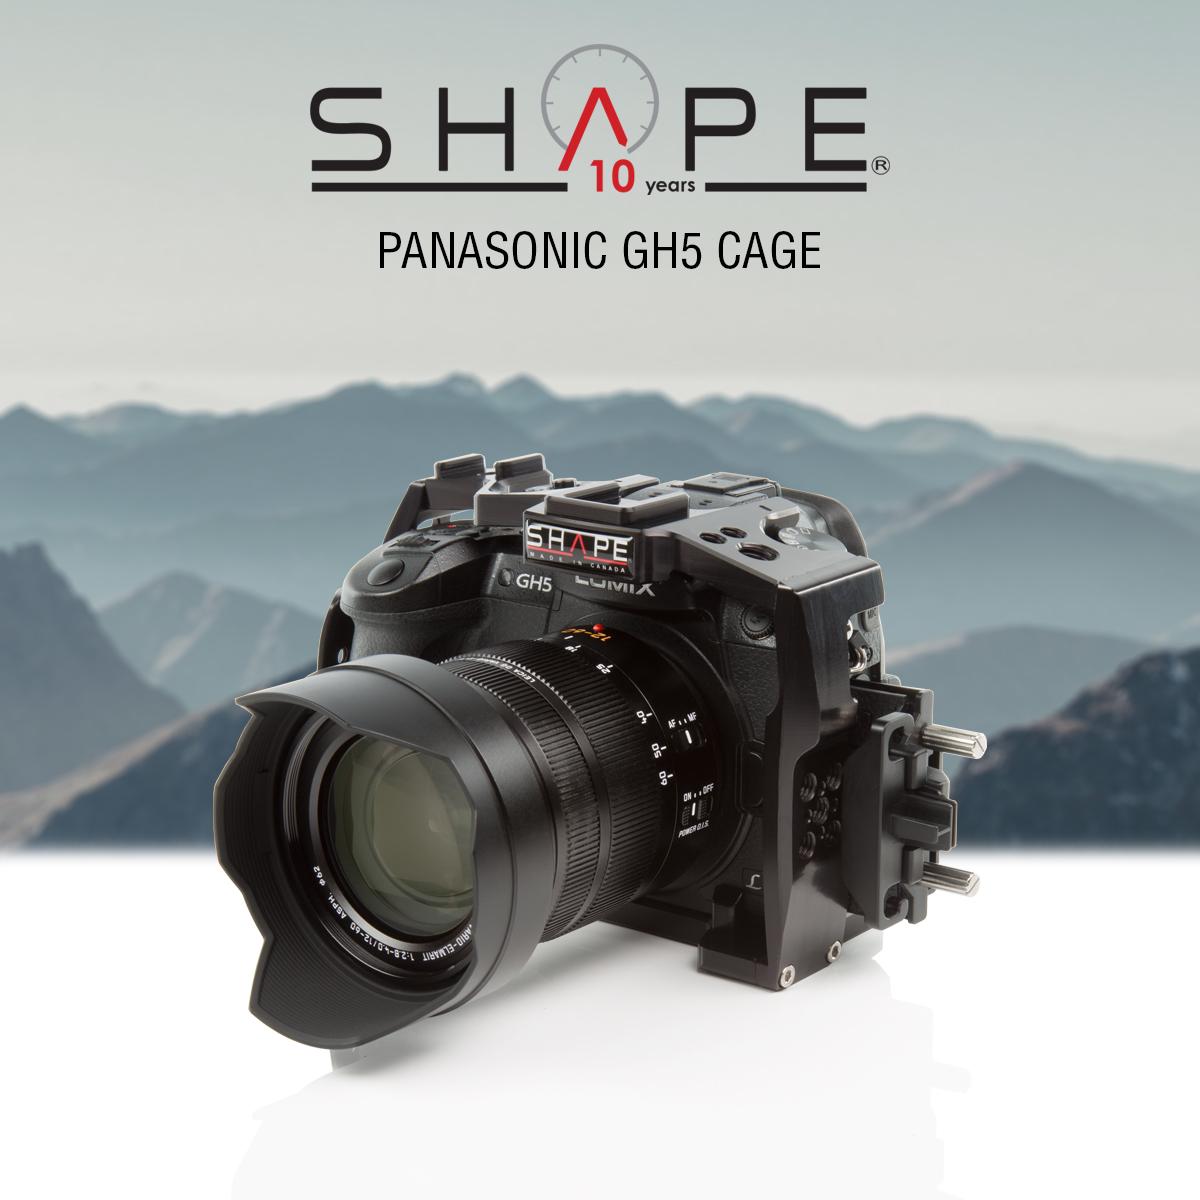 SHAPE GH5CAGE – Panasonic Lumix GH5 Cage